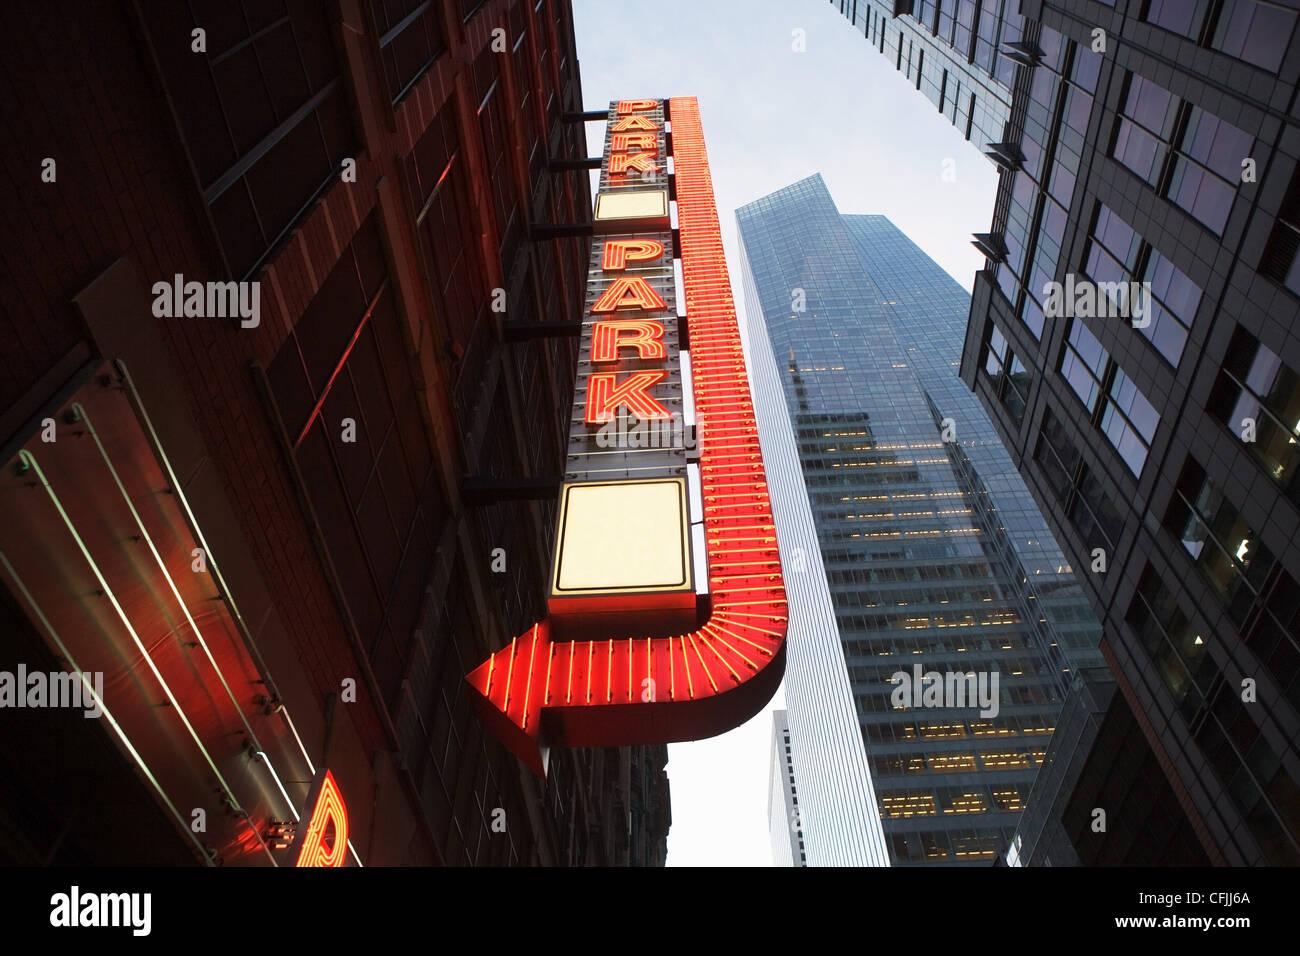 Car park sign, New York City, USA - Stock Image